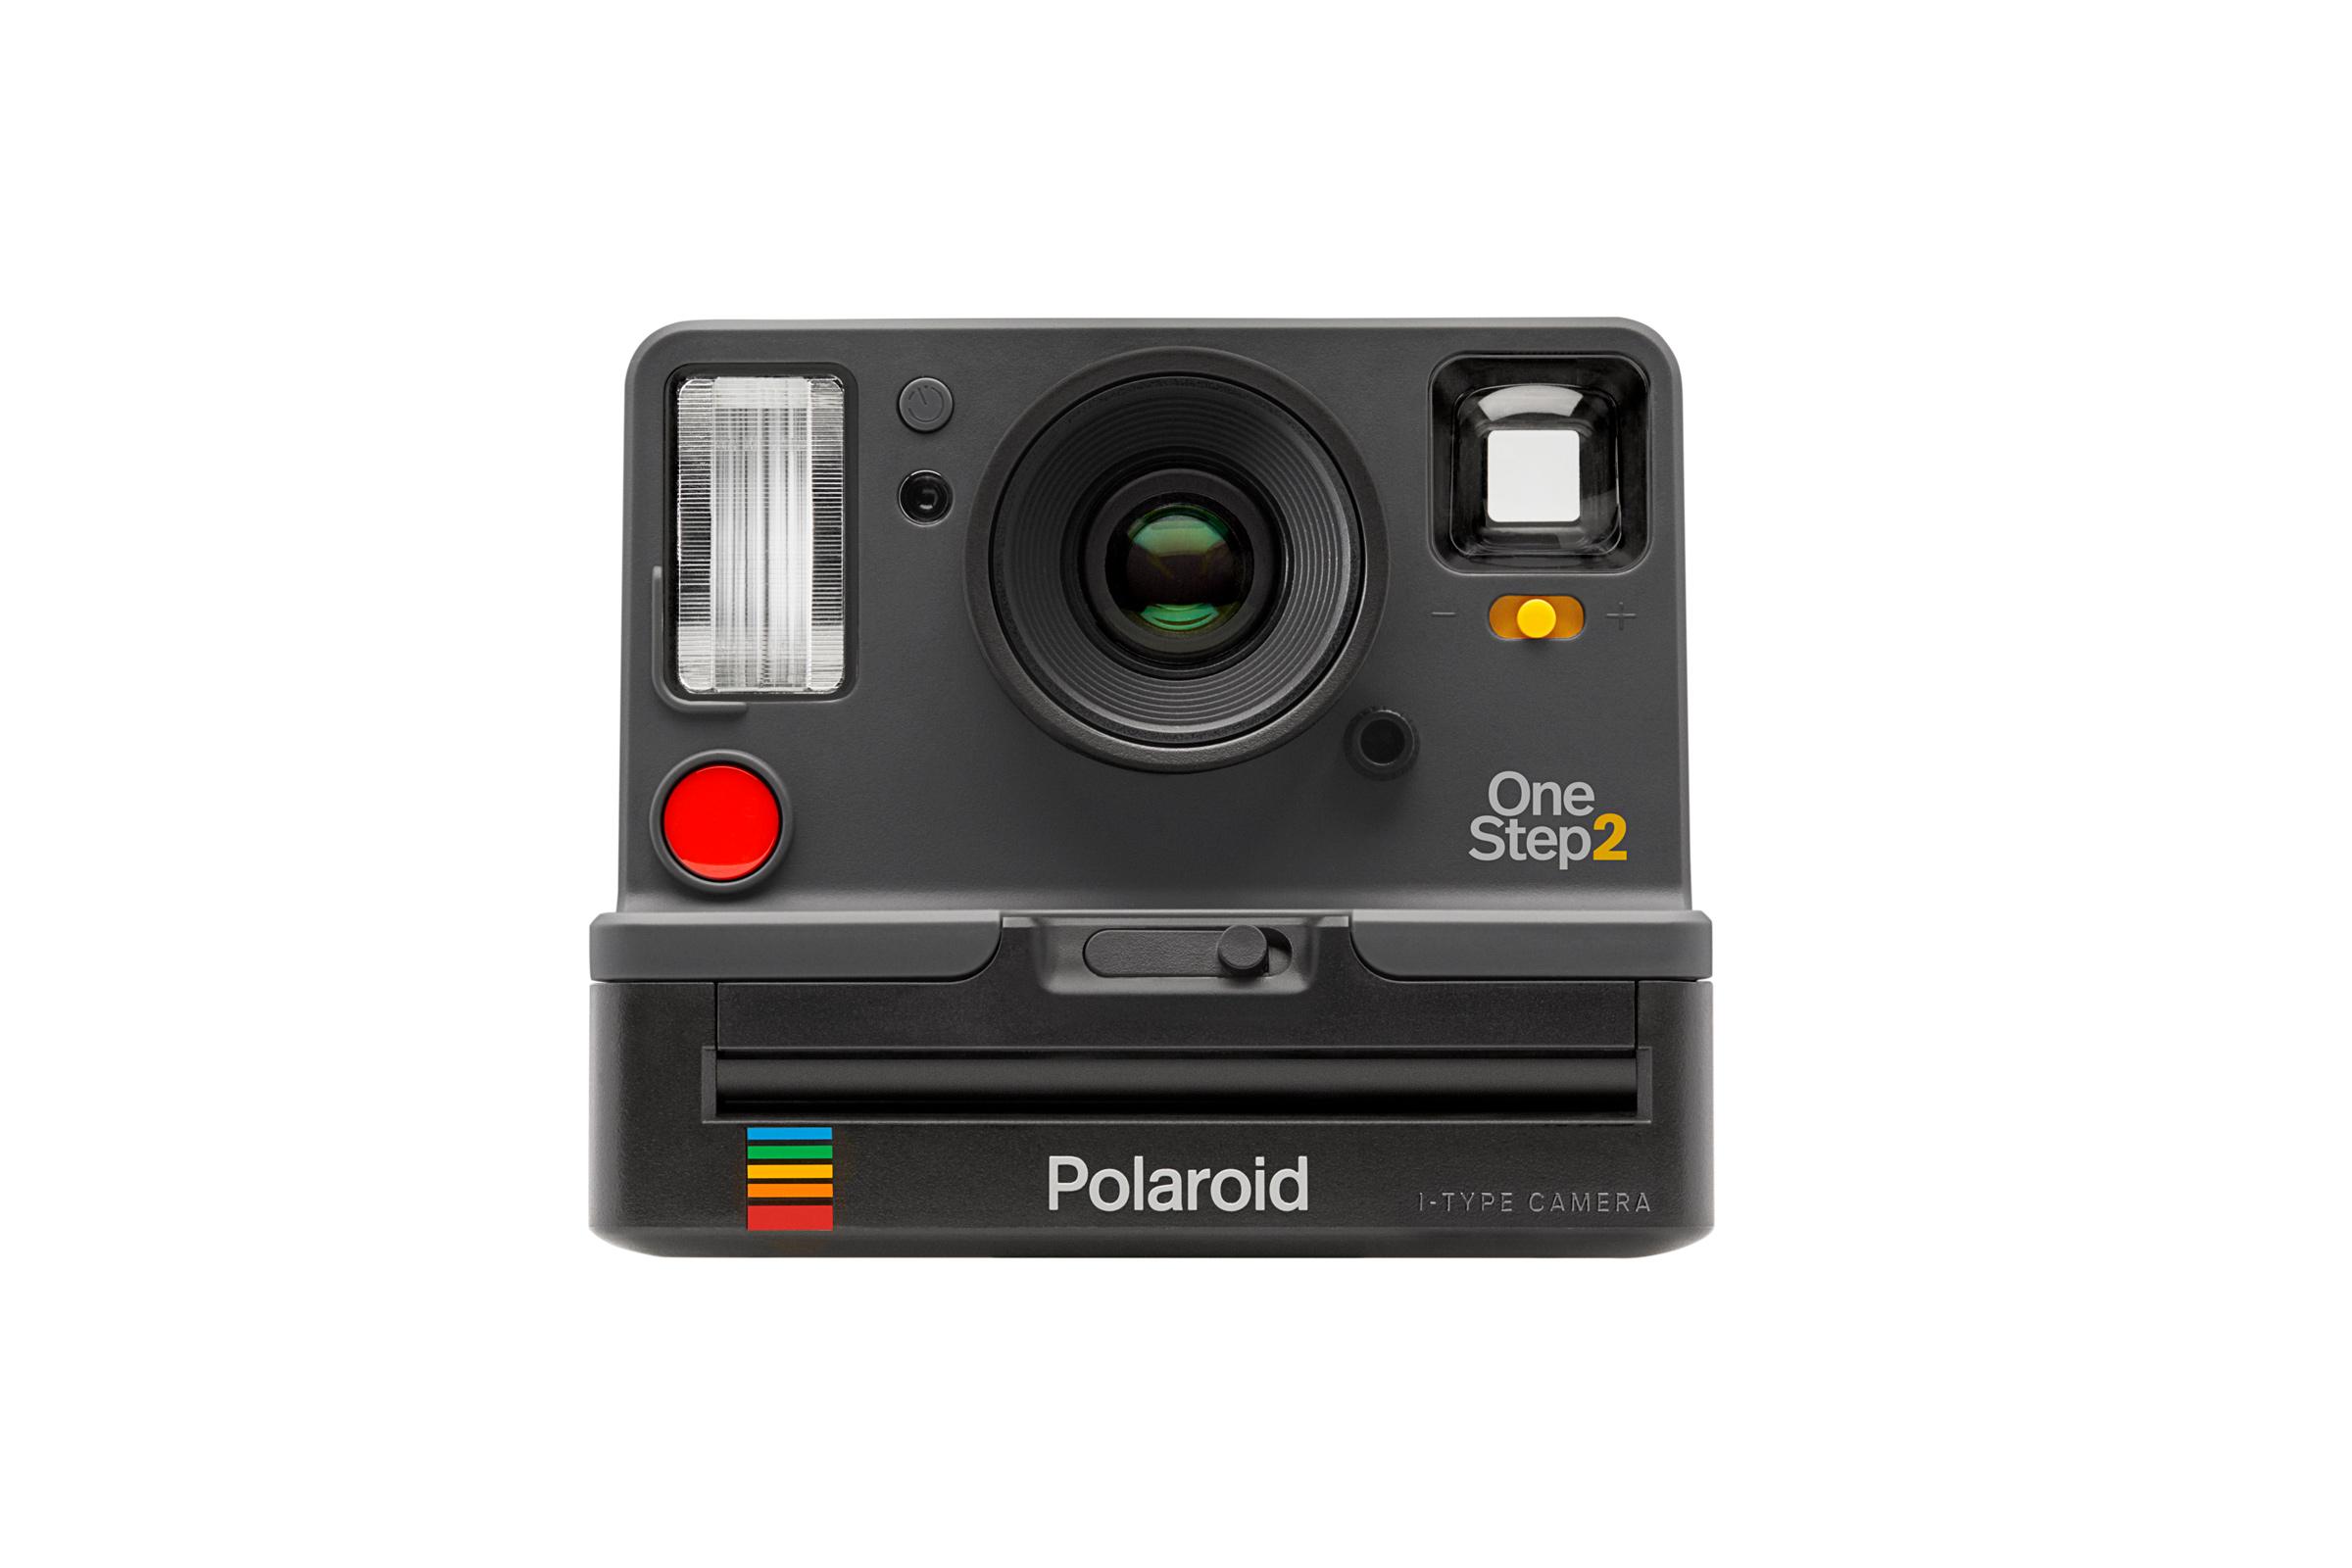 Polaroid OneStep 2 iType Camera  Graphite  Freestyle